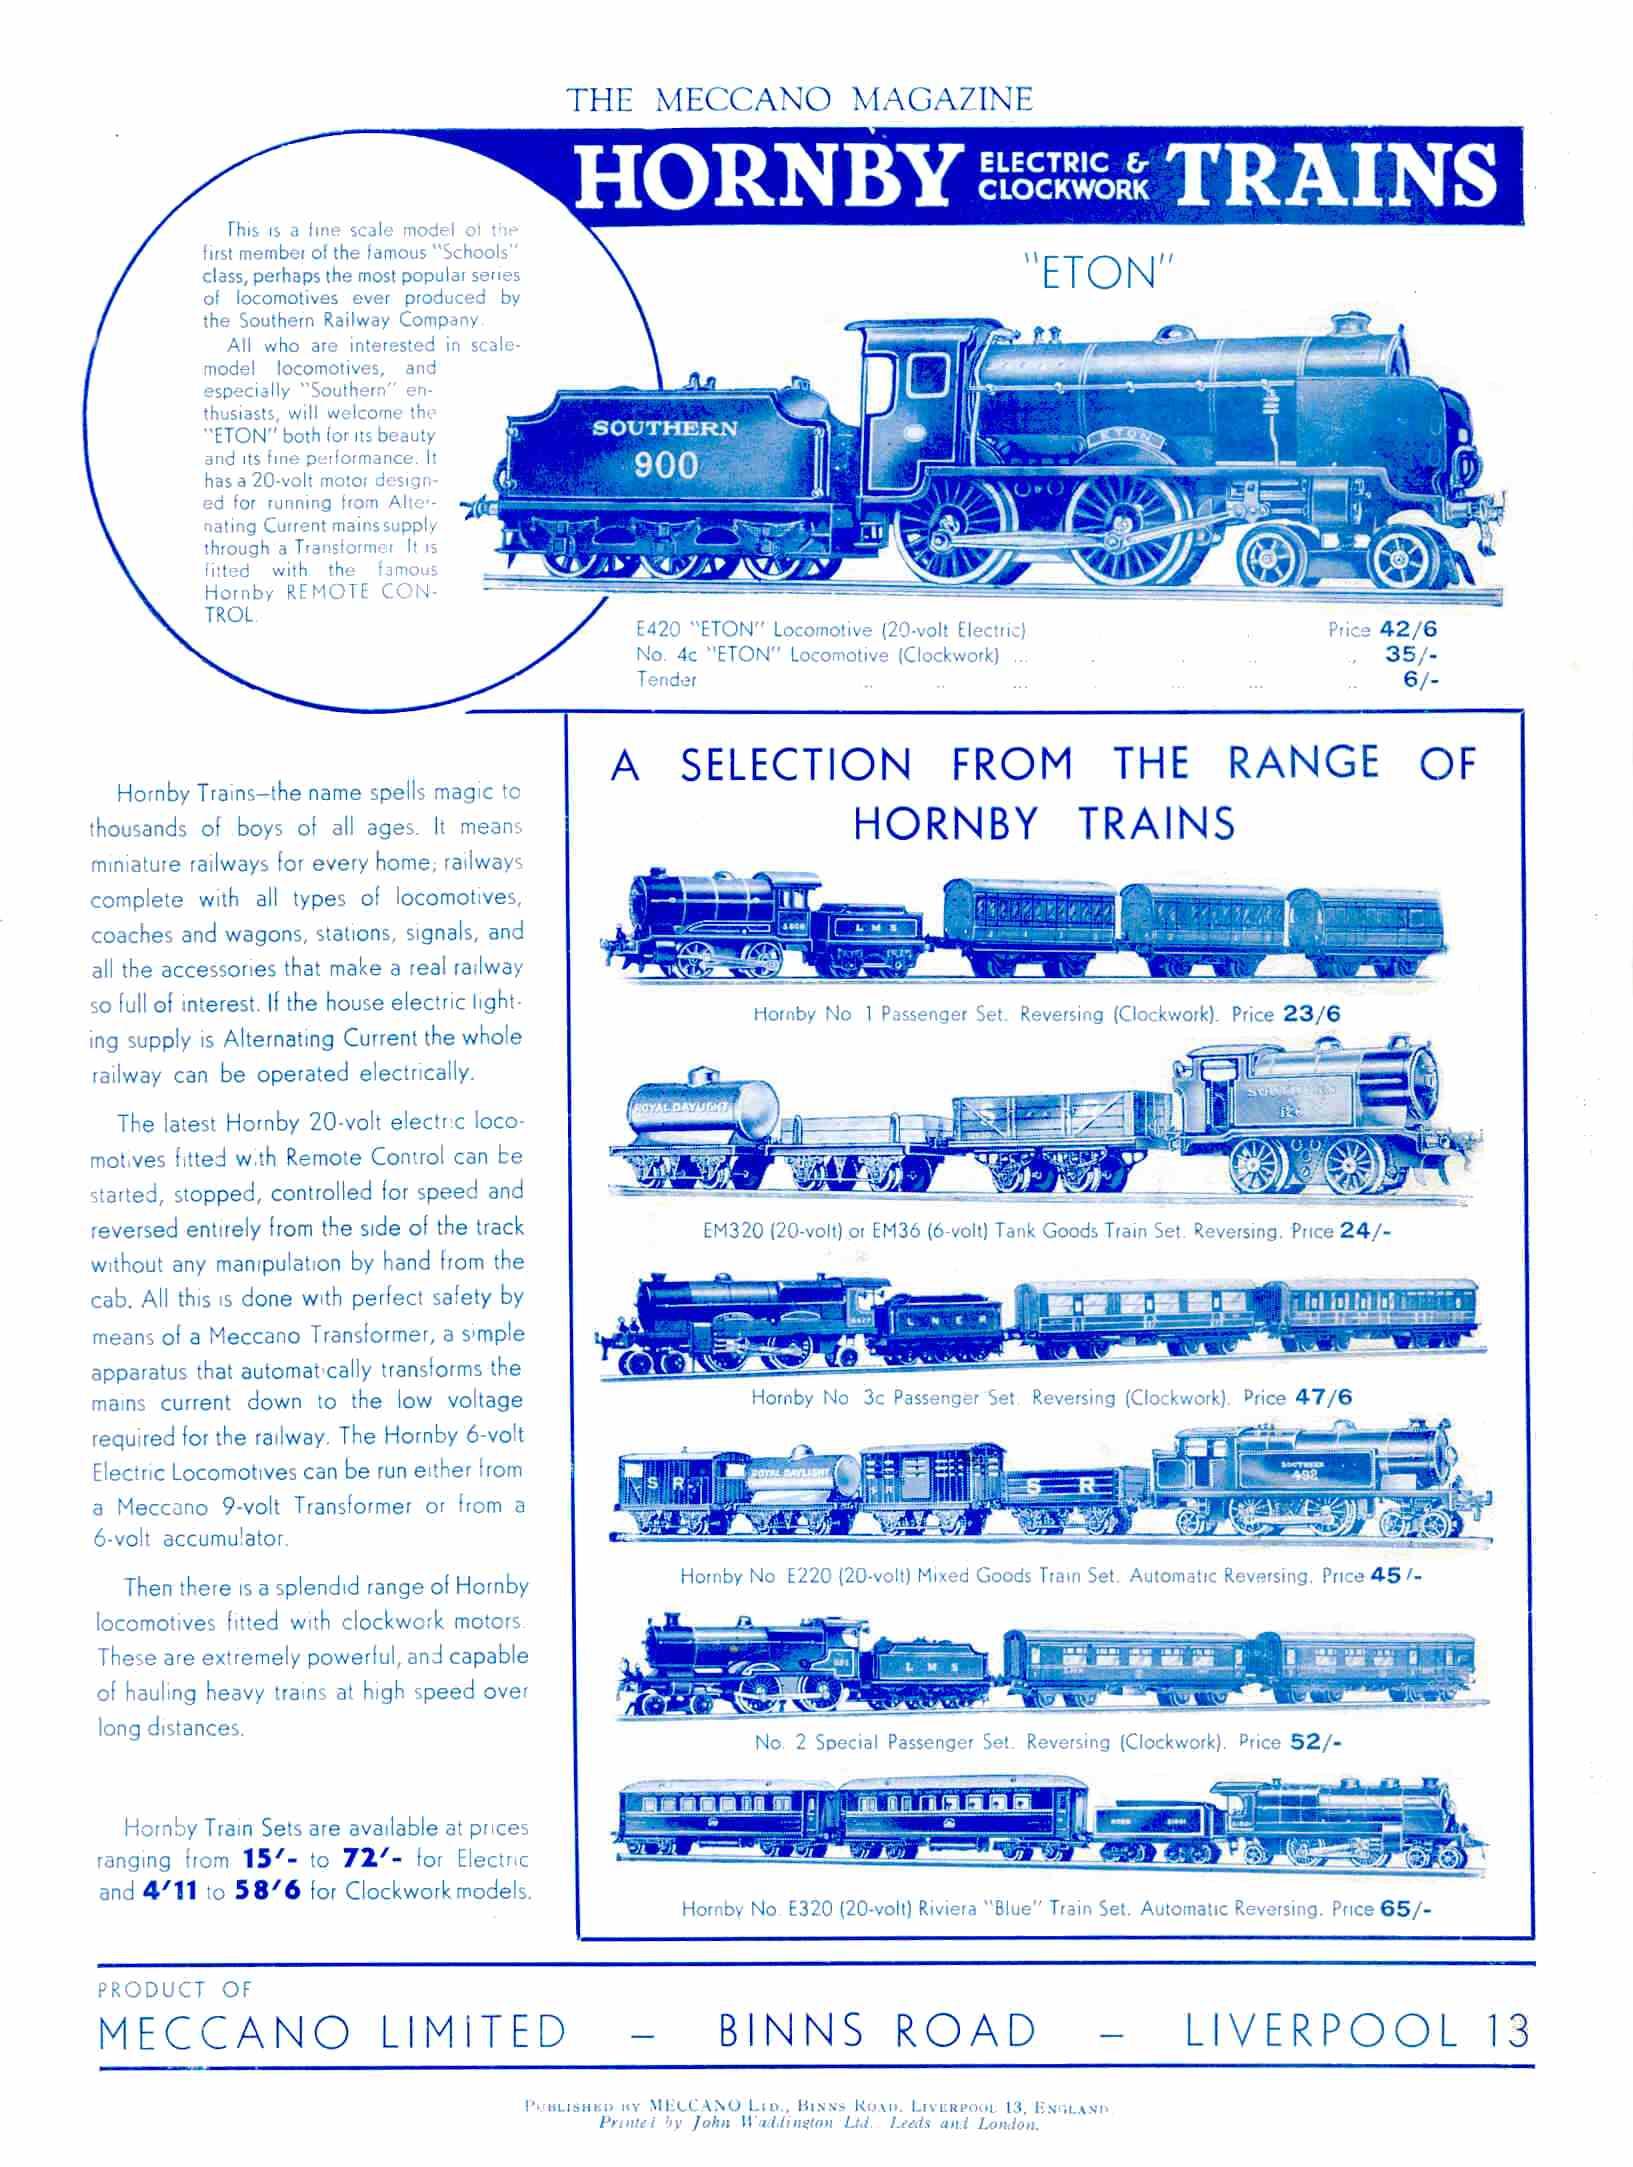 UK Meccano Magazine September 1937 Rear cover